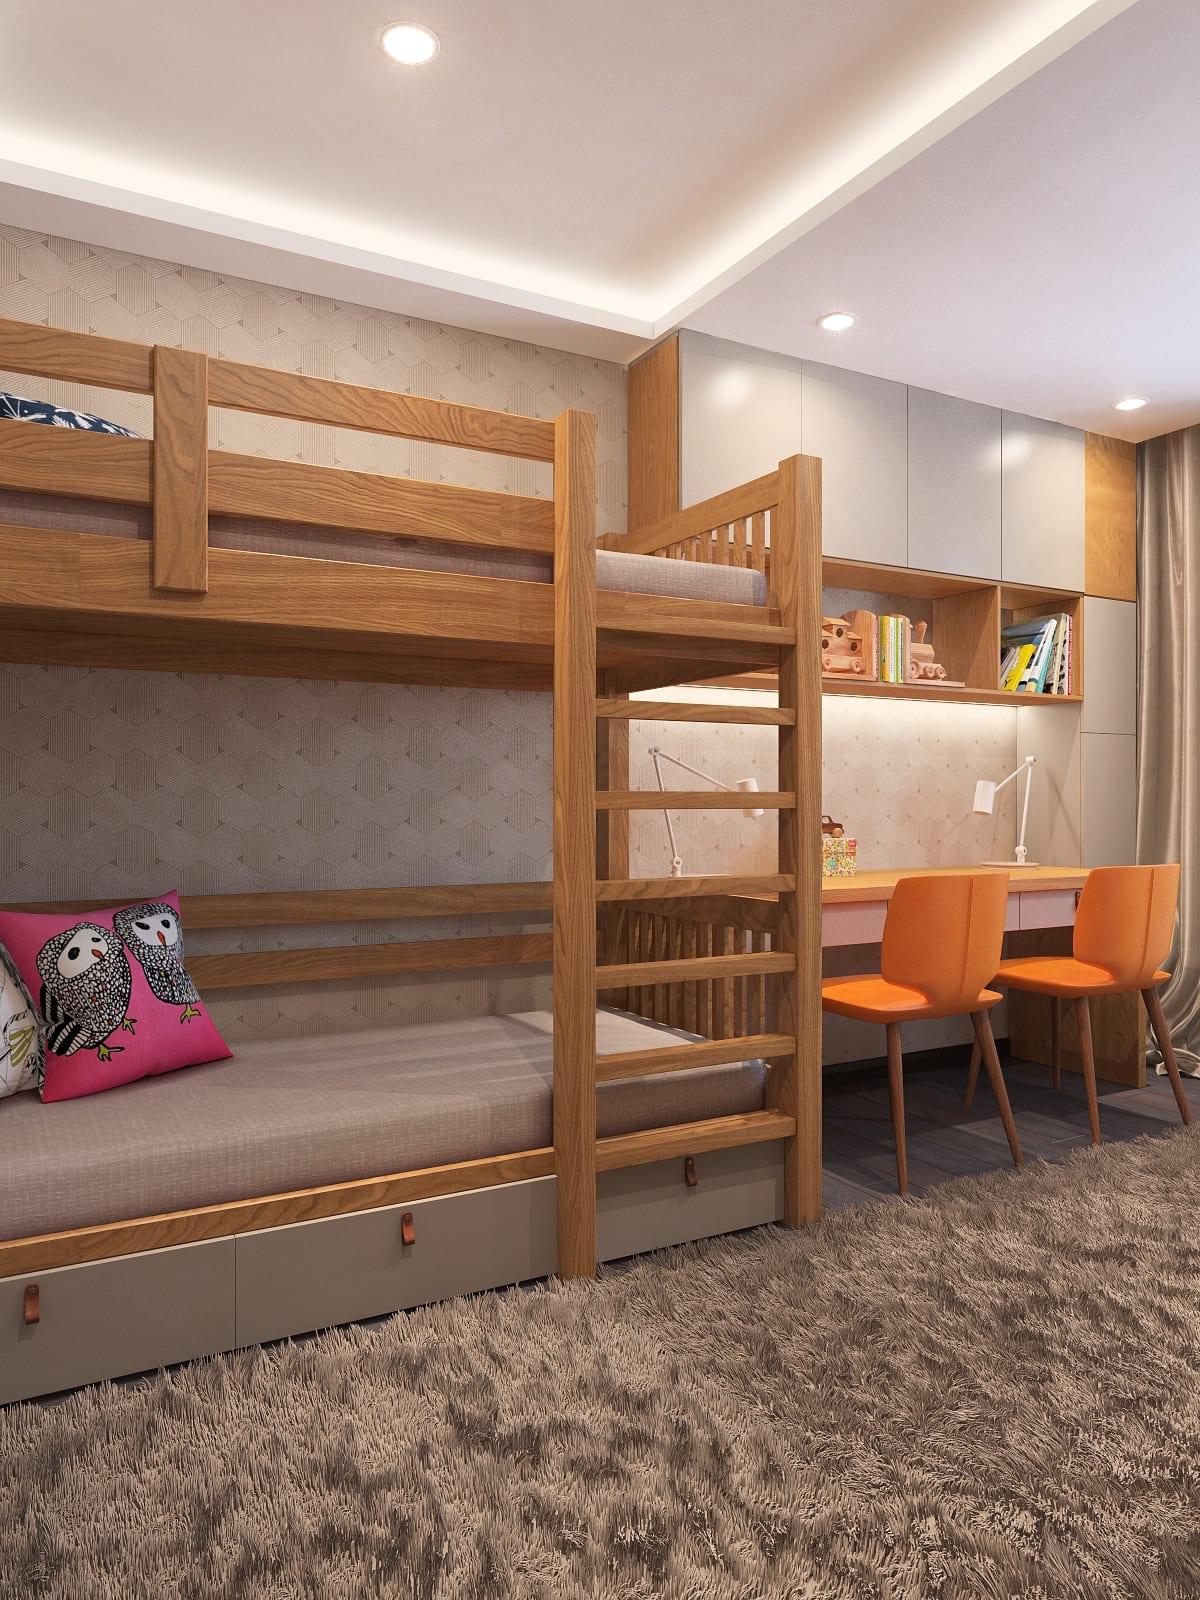 интерьер детской комнаты фото 106